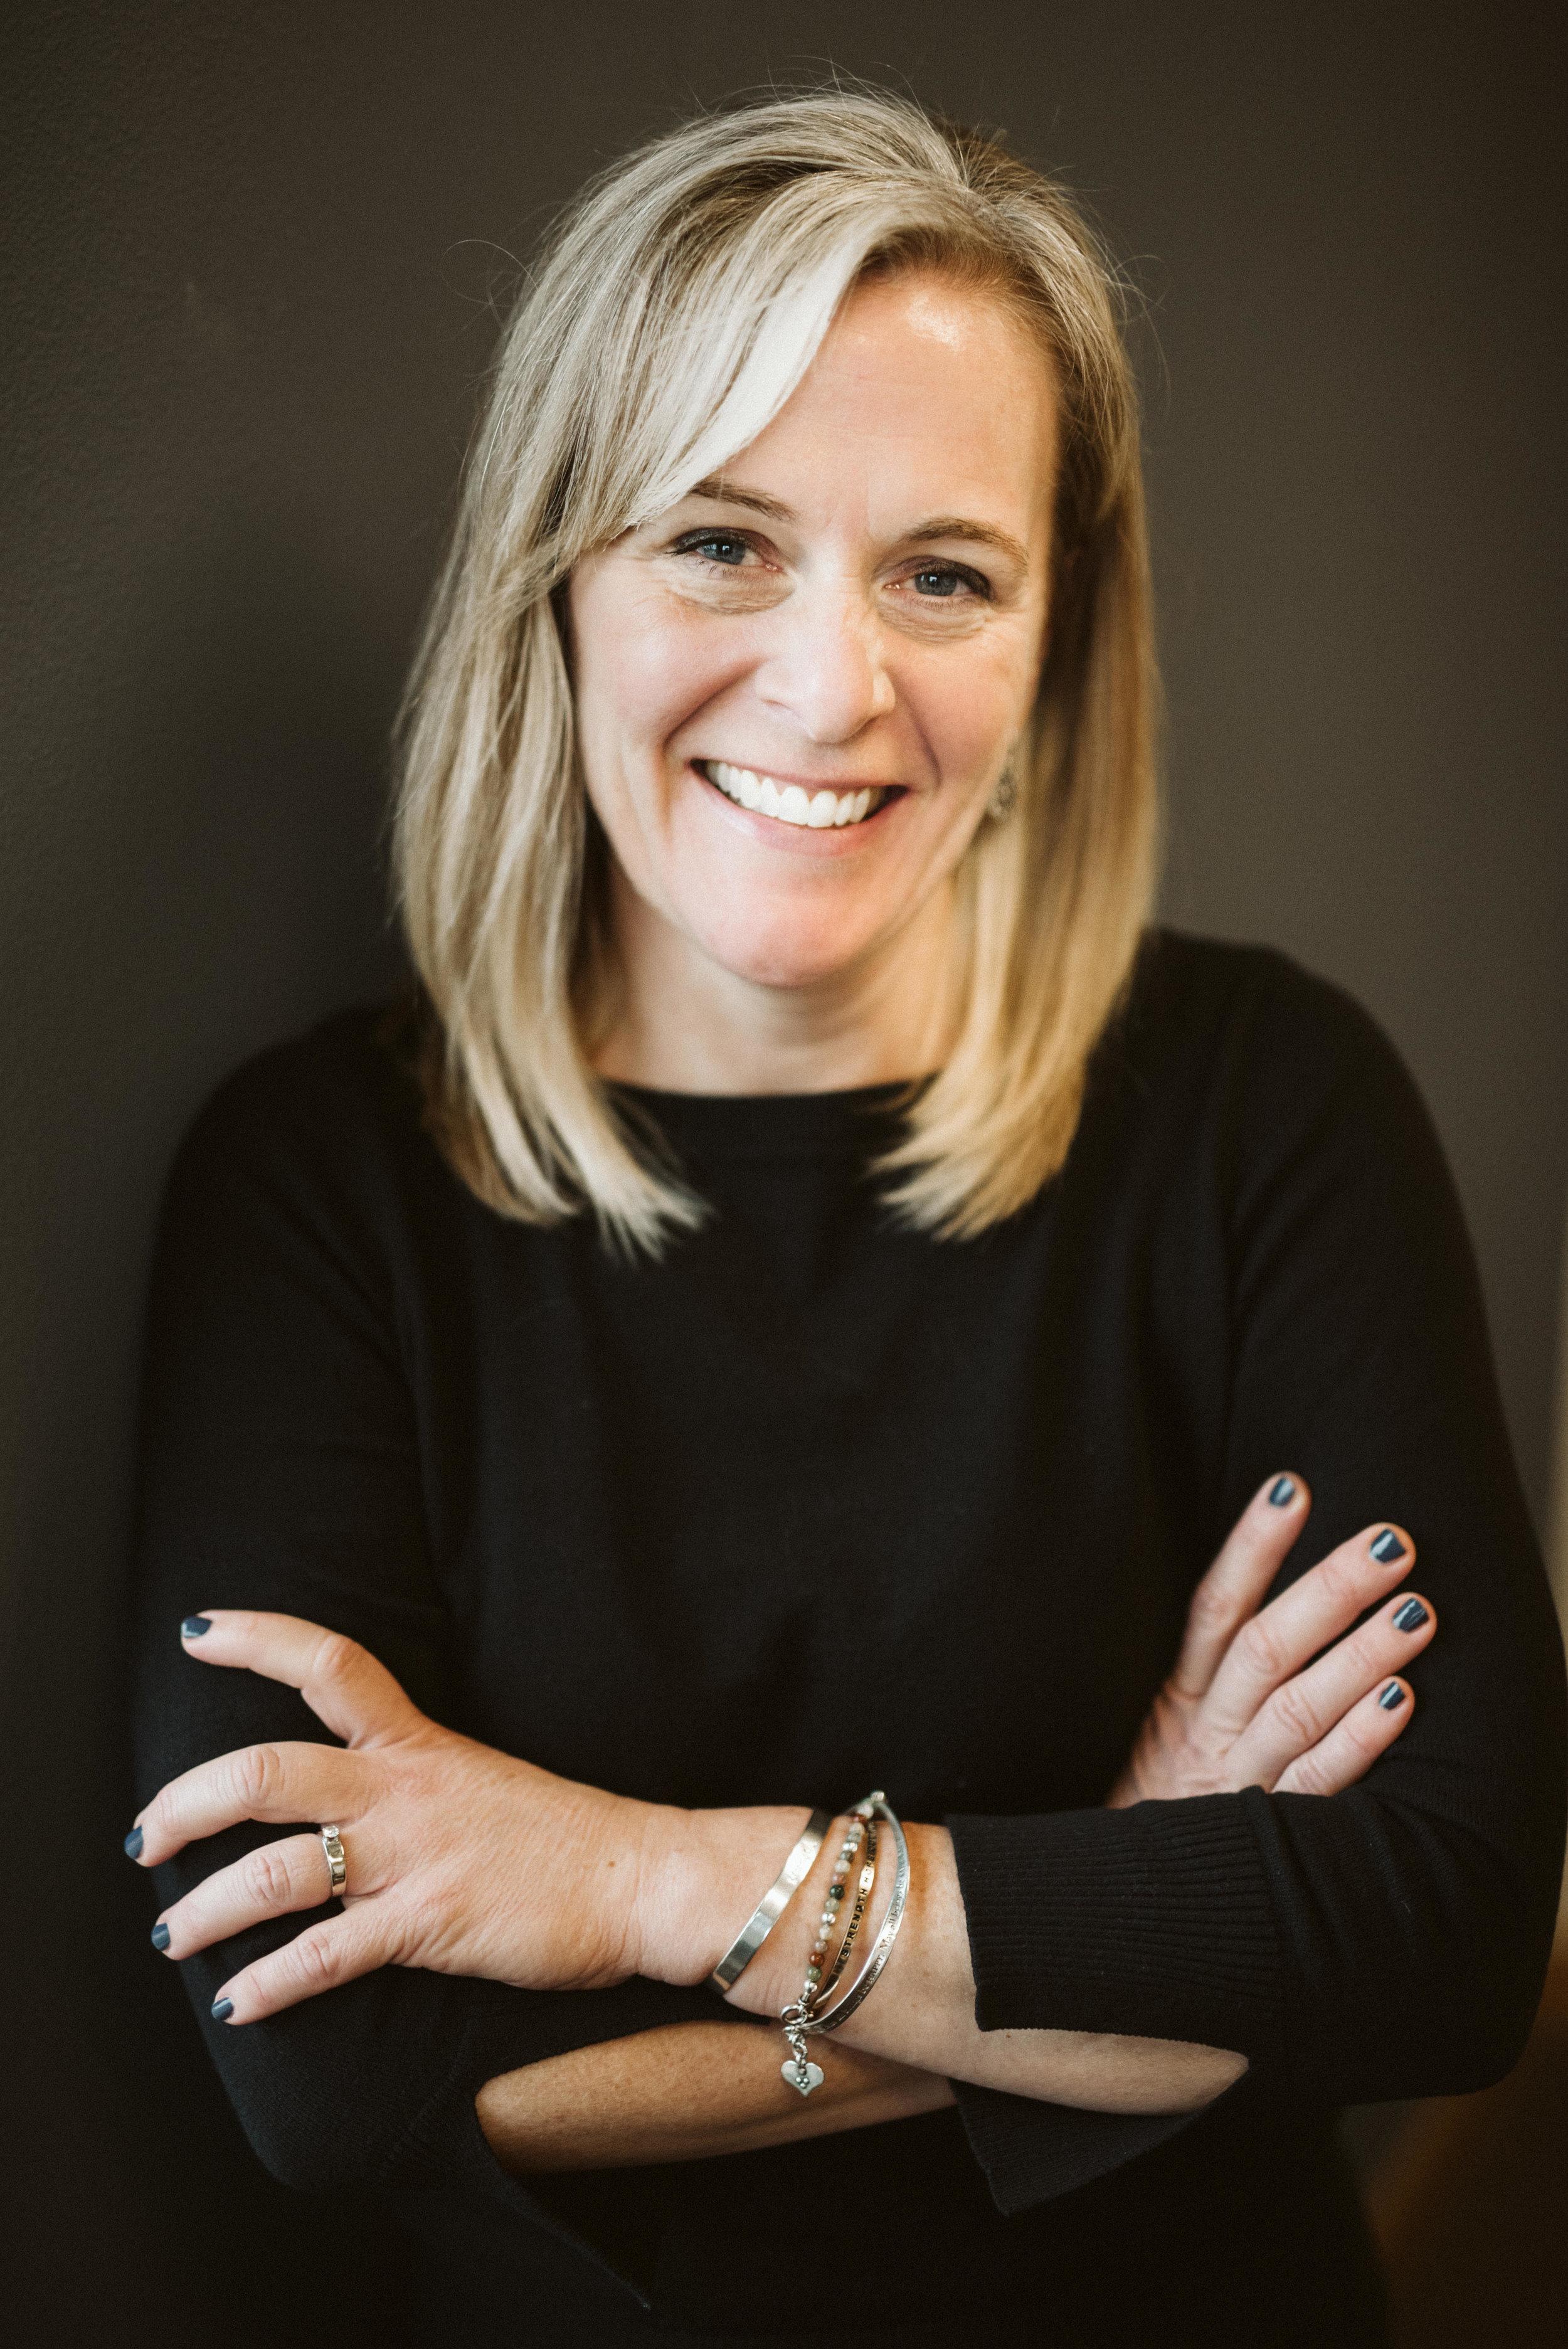 Claire Schulz Bergman Executive Director, Adoption Social Worker